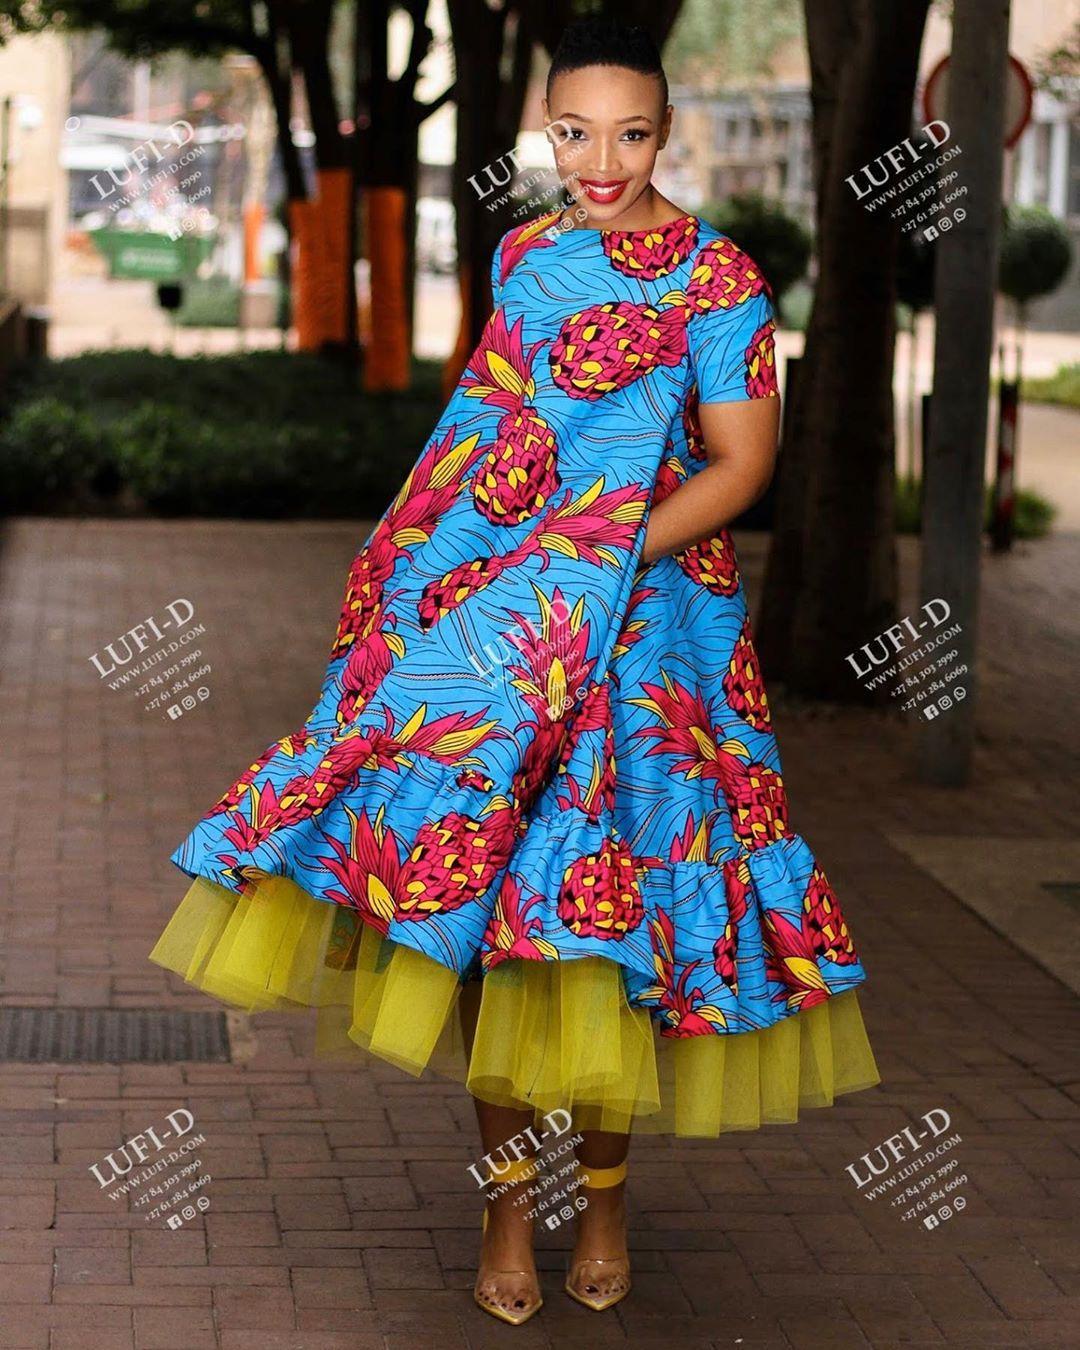 Pin by olga futshane on Weeding ideas   African design dresses ...